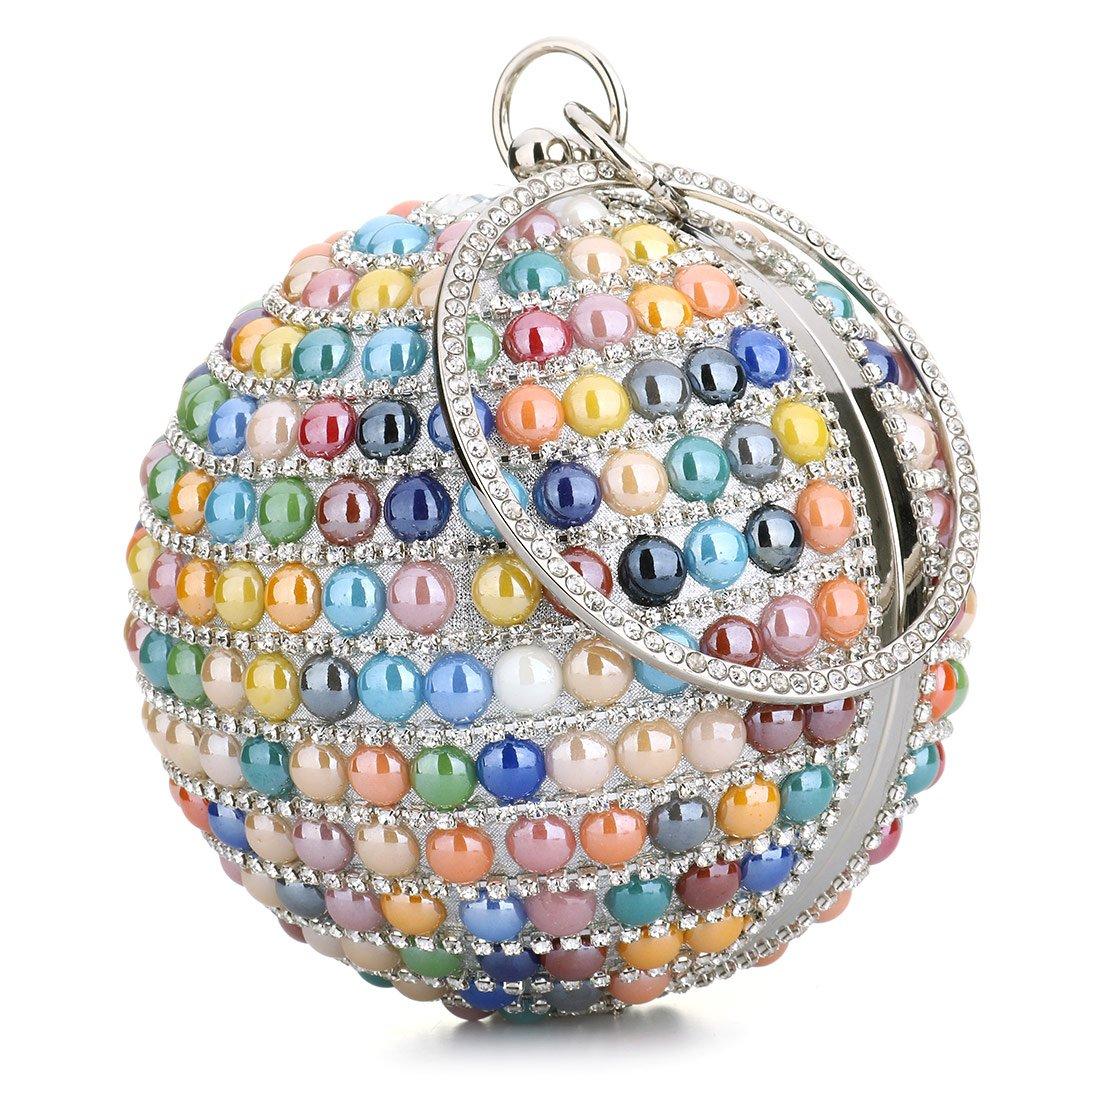 Woman Beaded Round Ball Clutch Handbag Rhinestone Ring Handle Purse Evening Bag